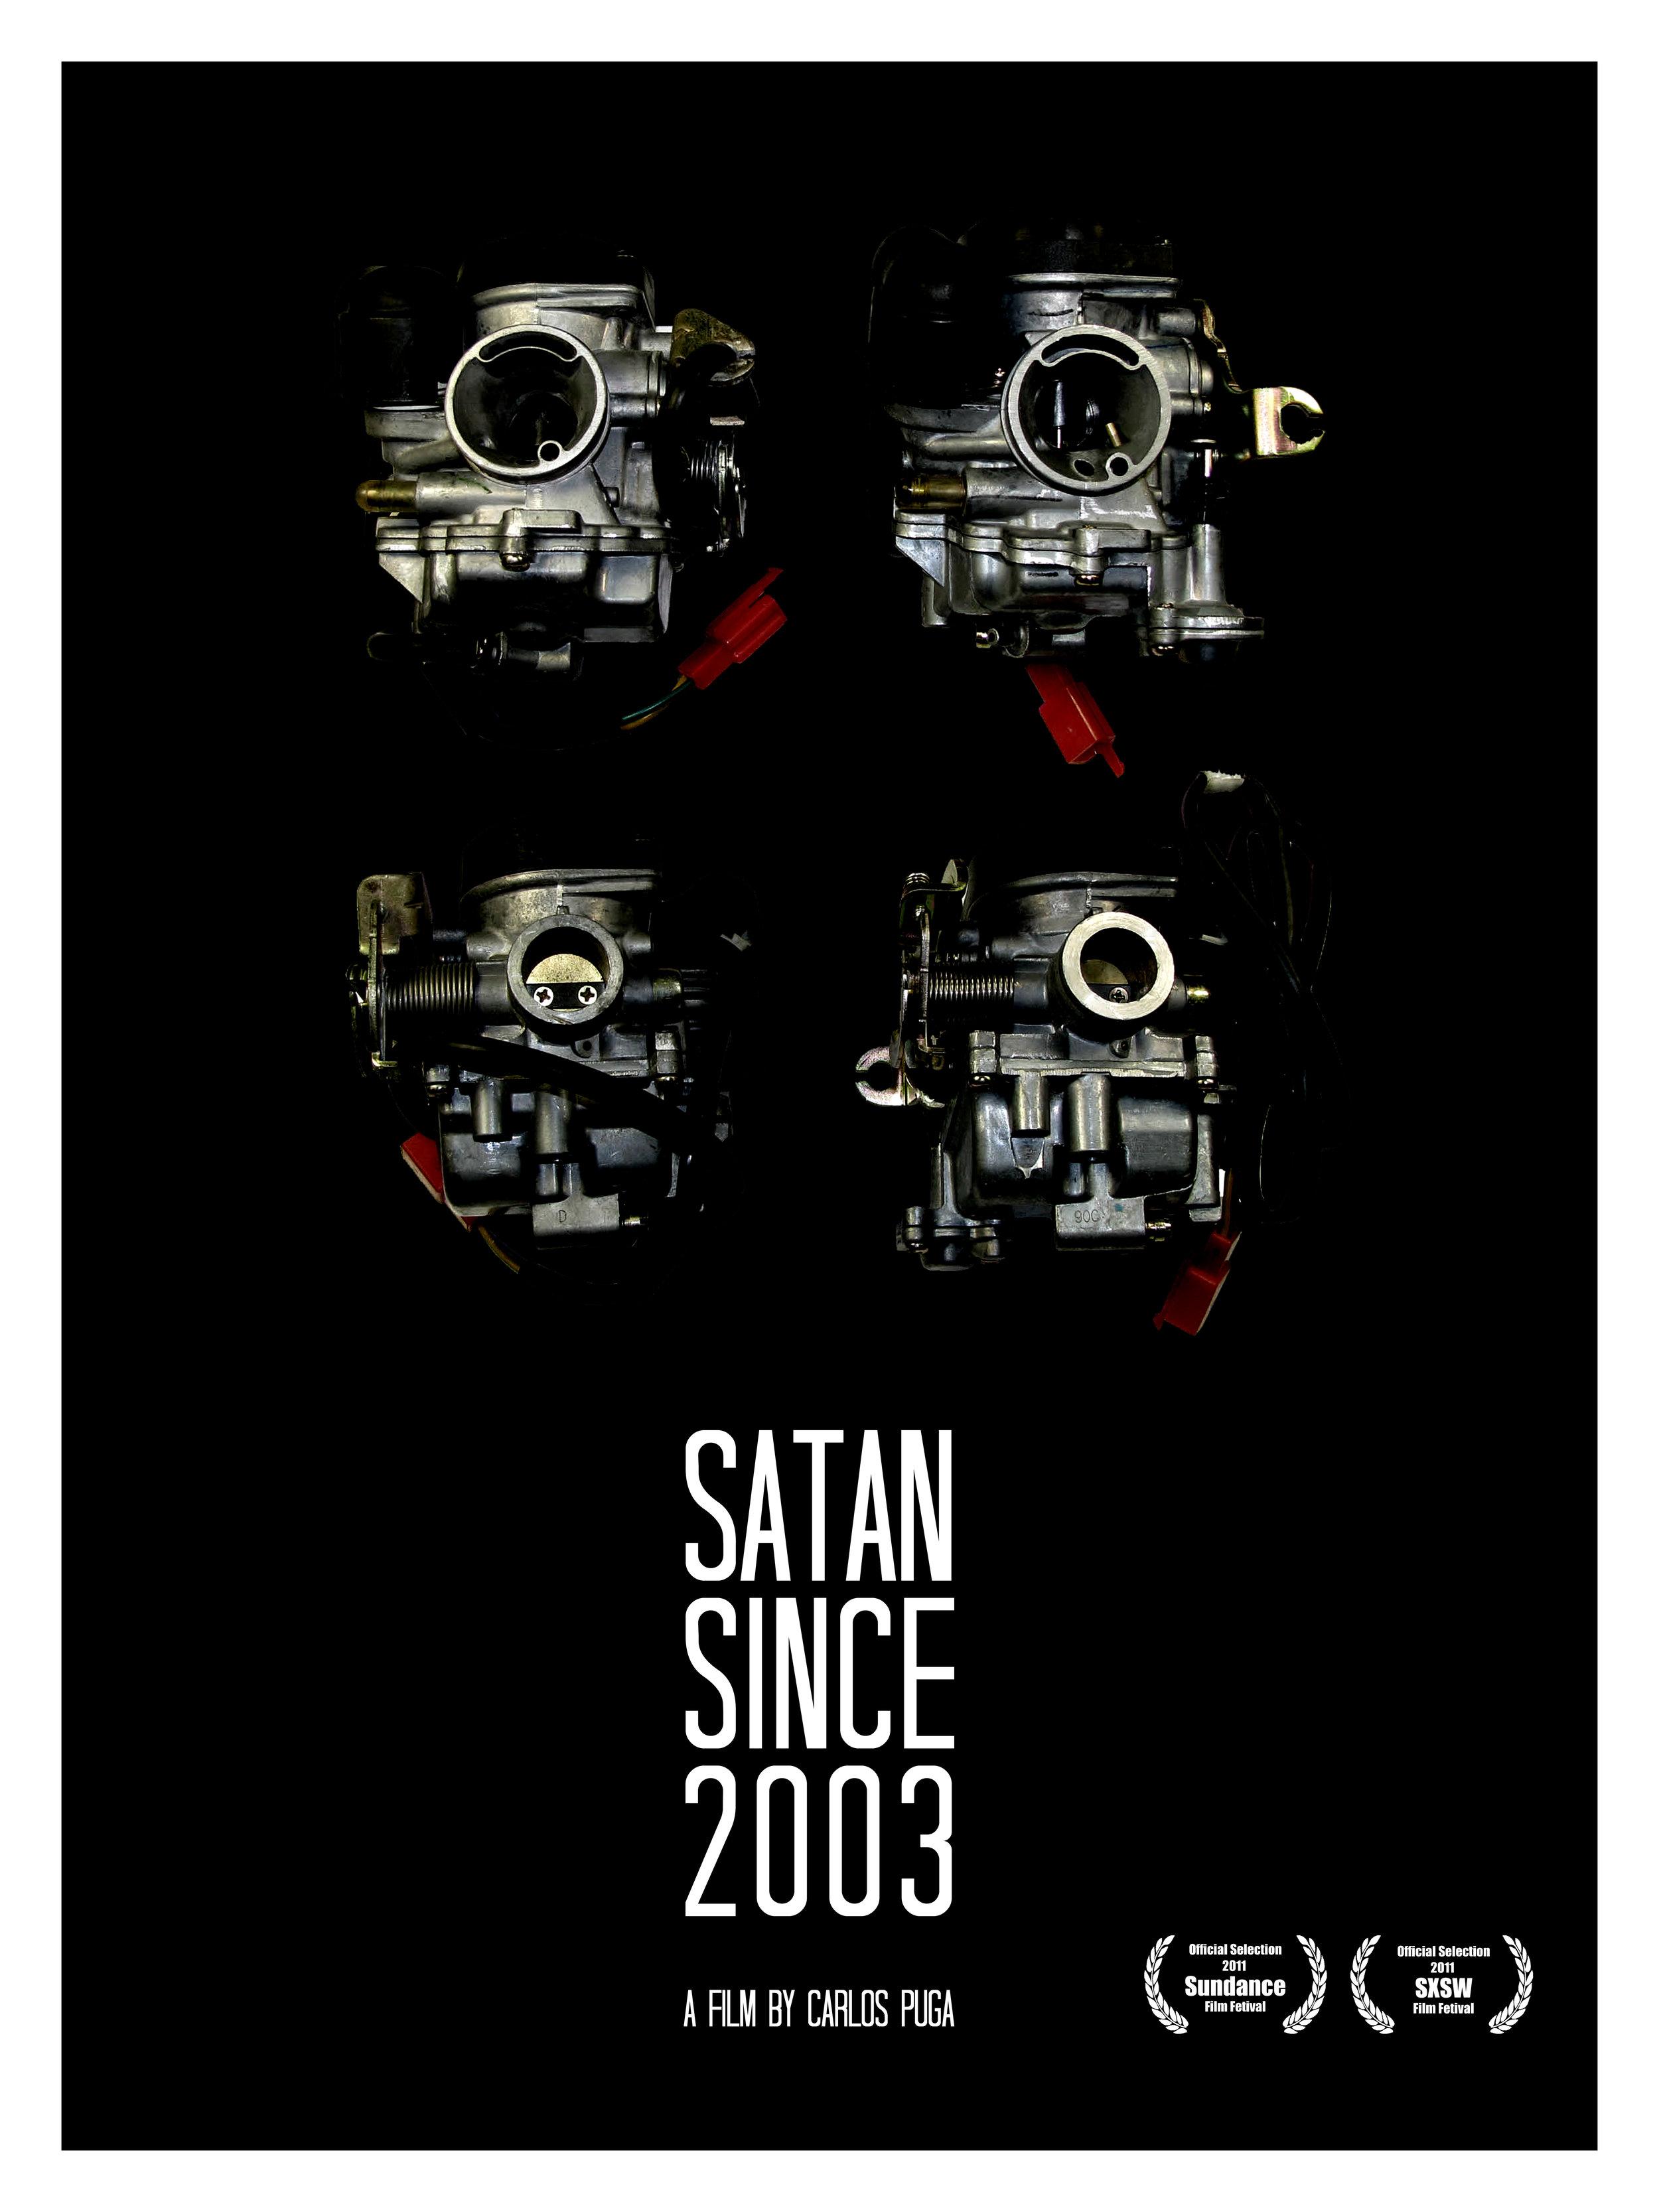 SS2003_POSTER_withlaurels 2.jpg